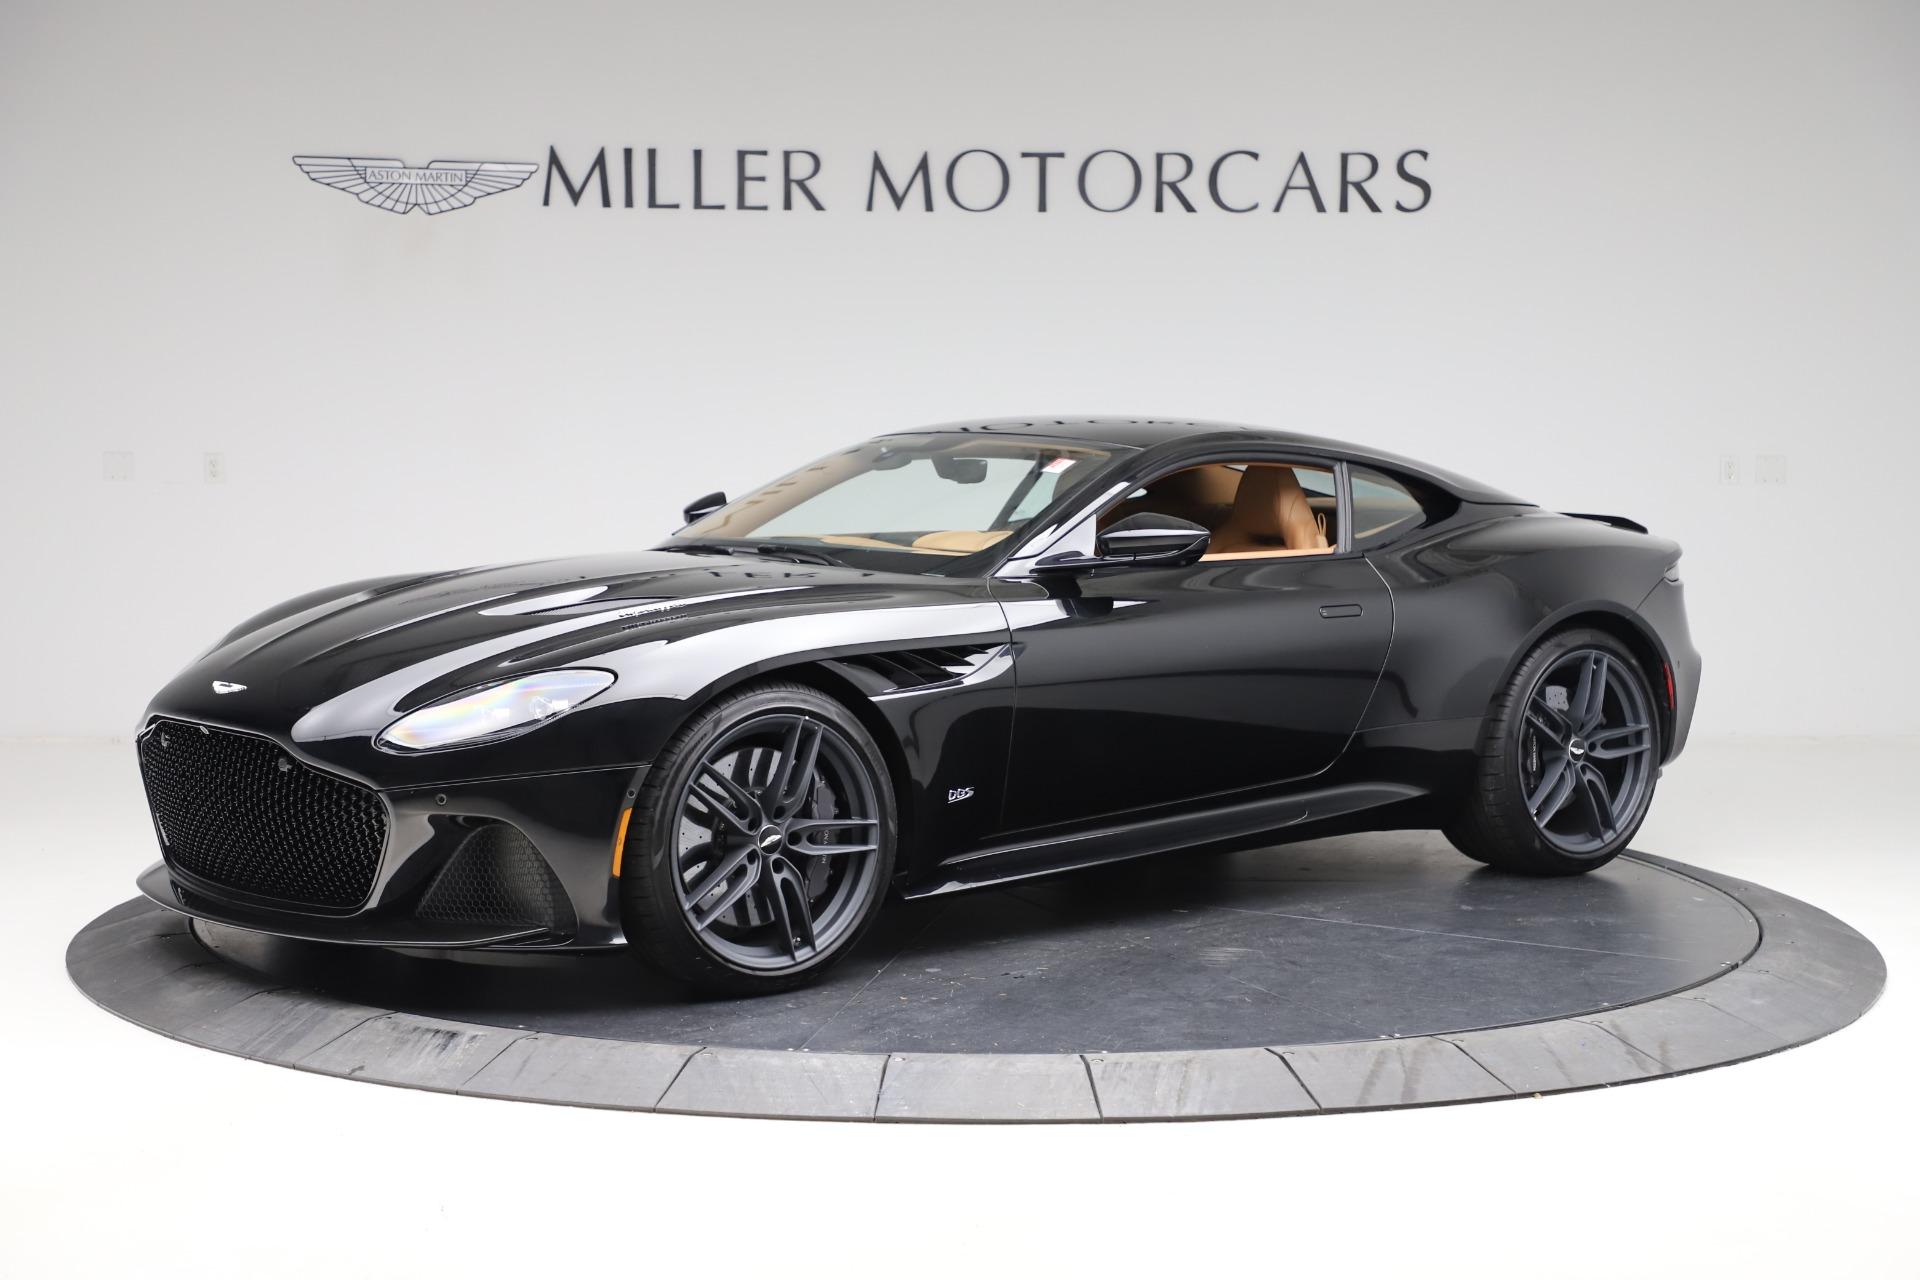 New 2019 Aston Martin DBS Superleggera Coupe for sale Sold at Alfa Romeo of Greenwich in Greenwich CT 06830 1